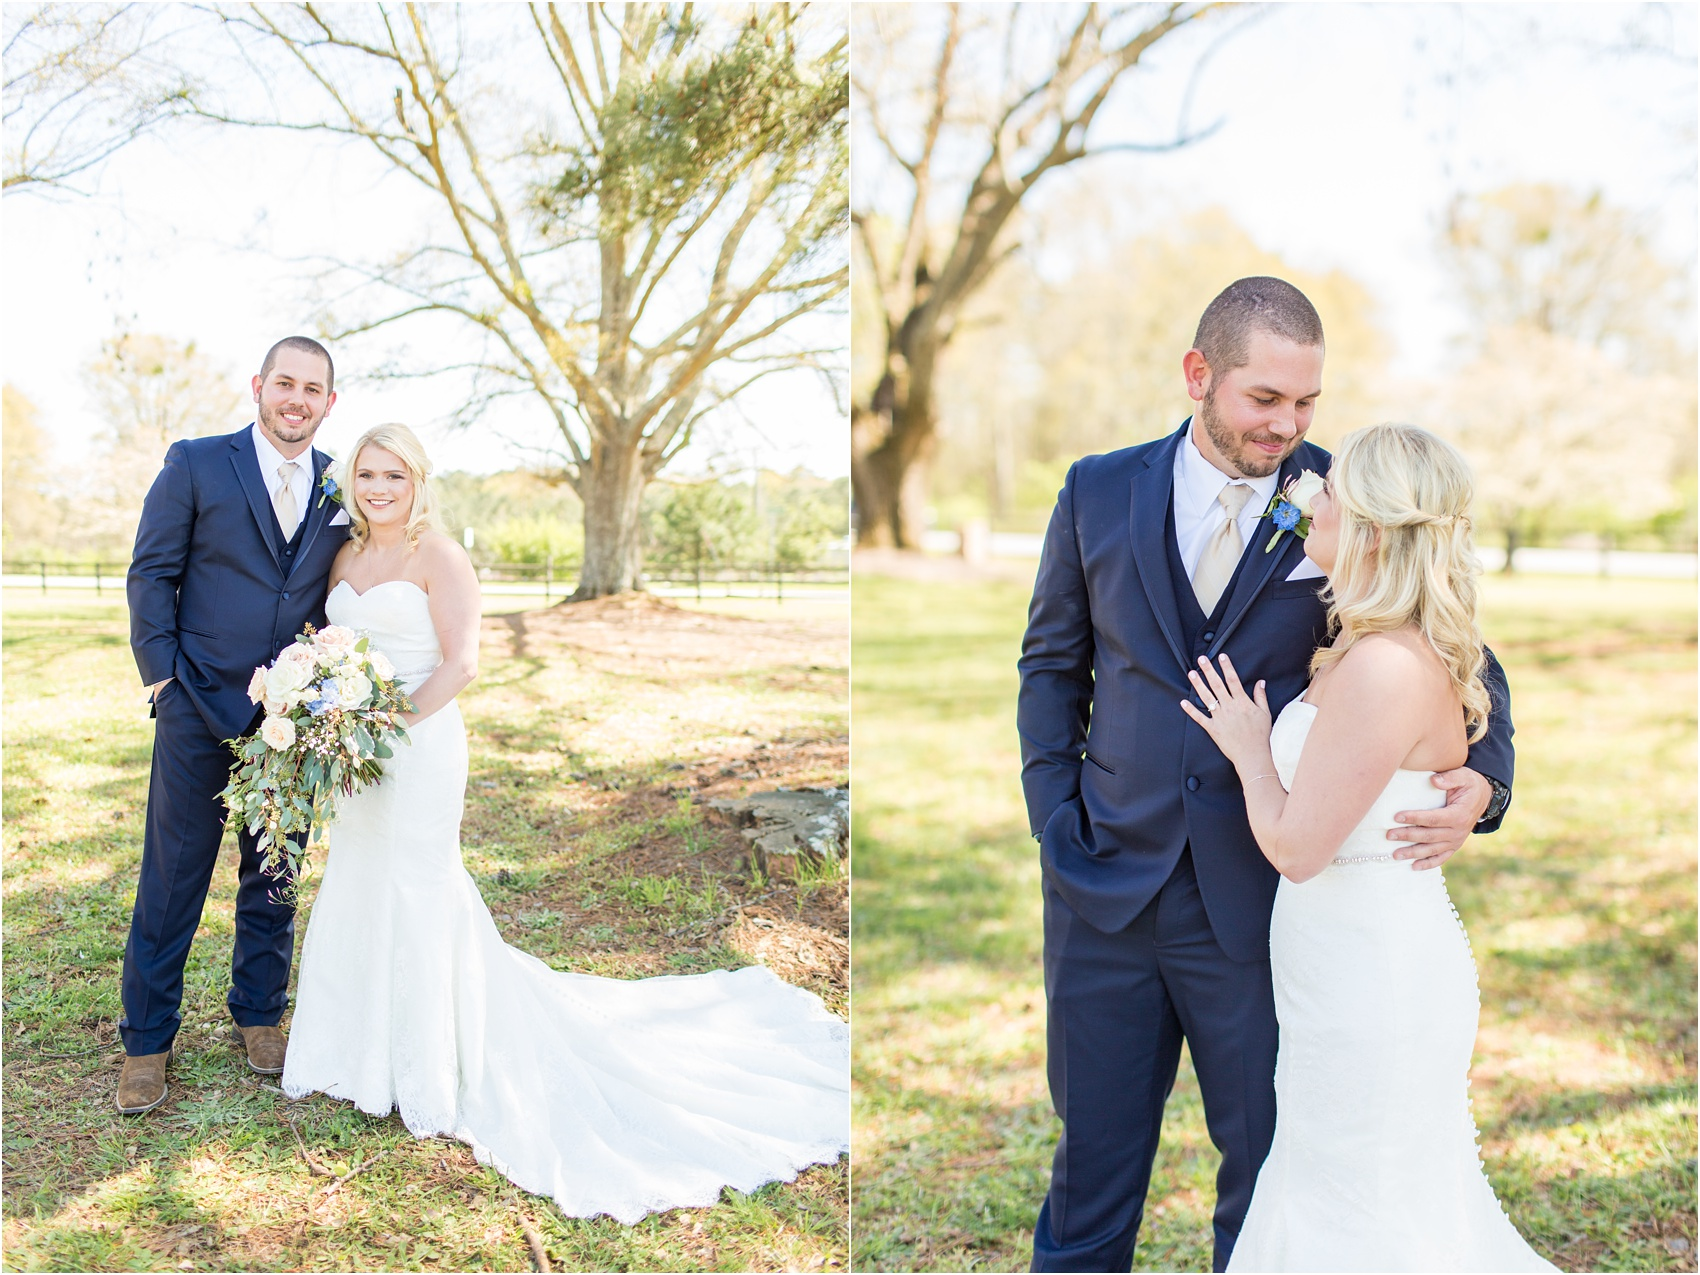 Savannah Eve Photography- Wade Wedding-23.jpg